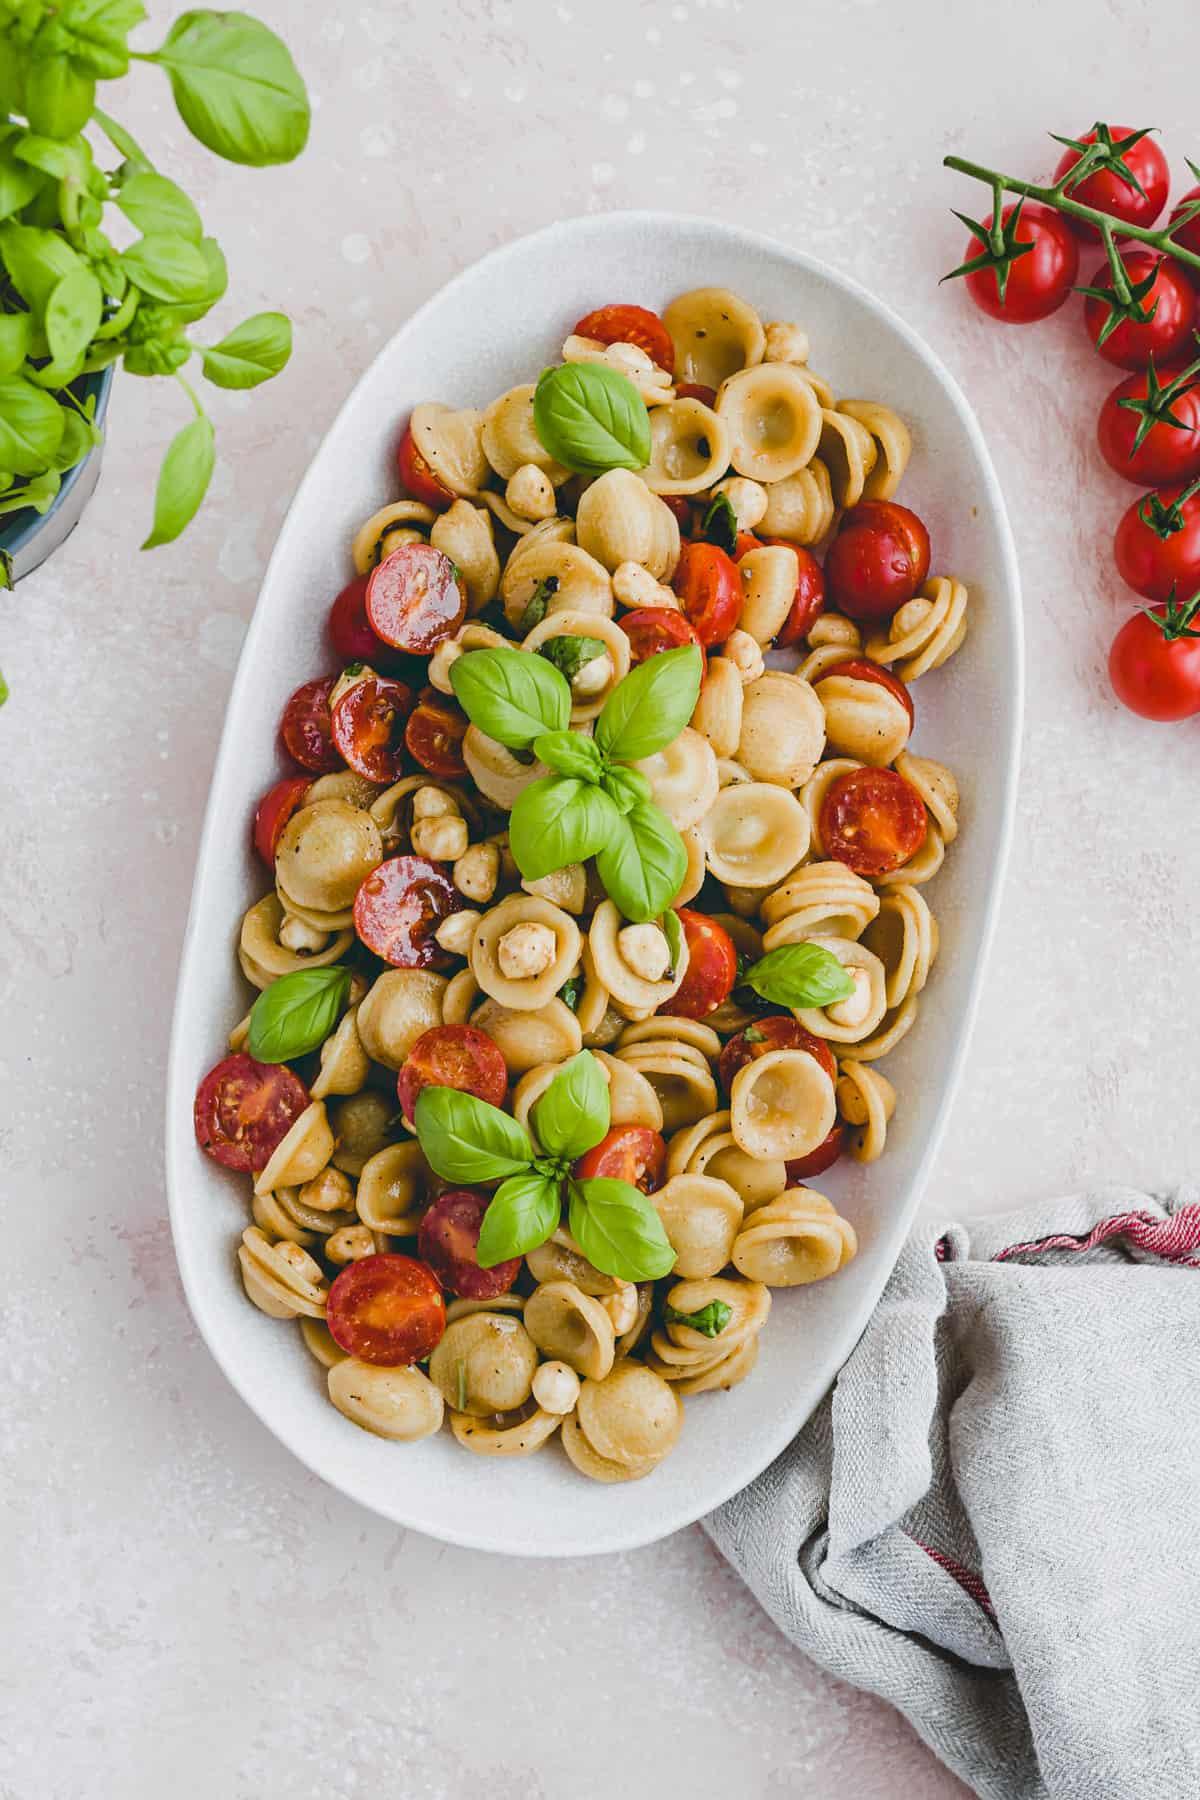 nudelsalat mit mozzarella, basilikum, und cherrytomaten